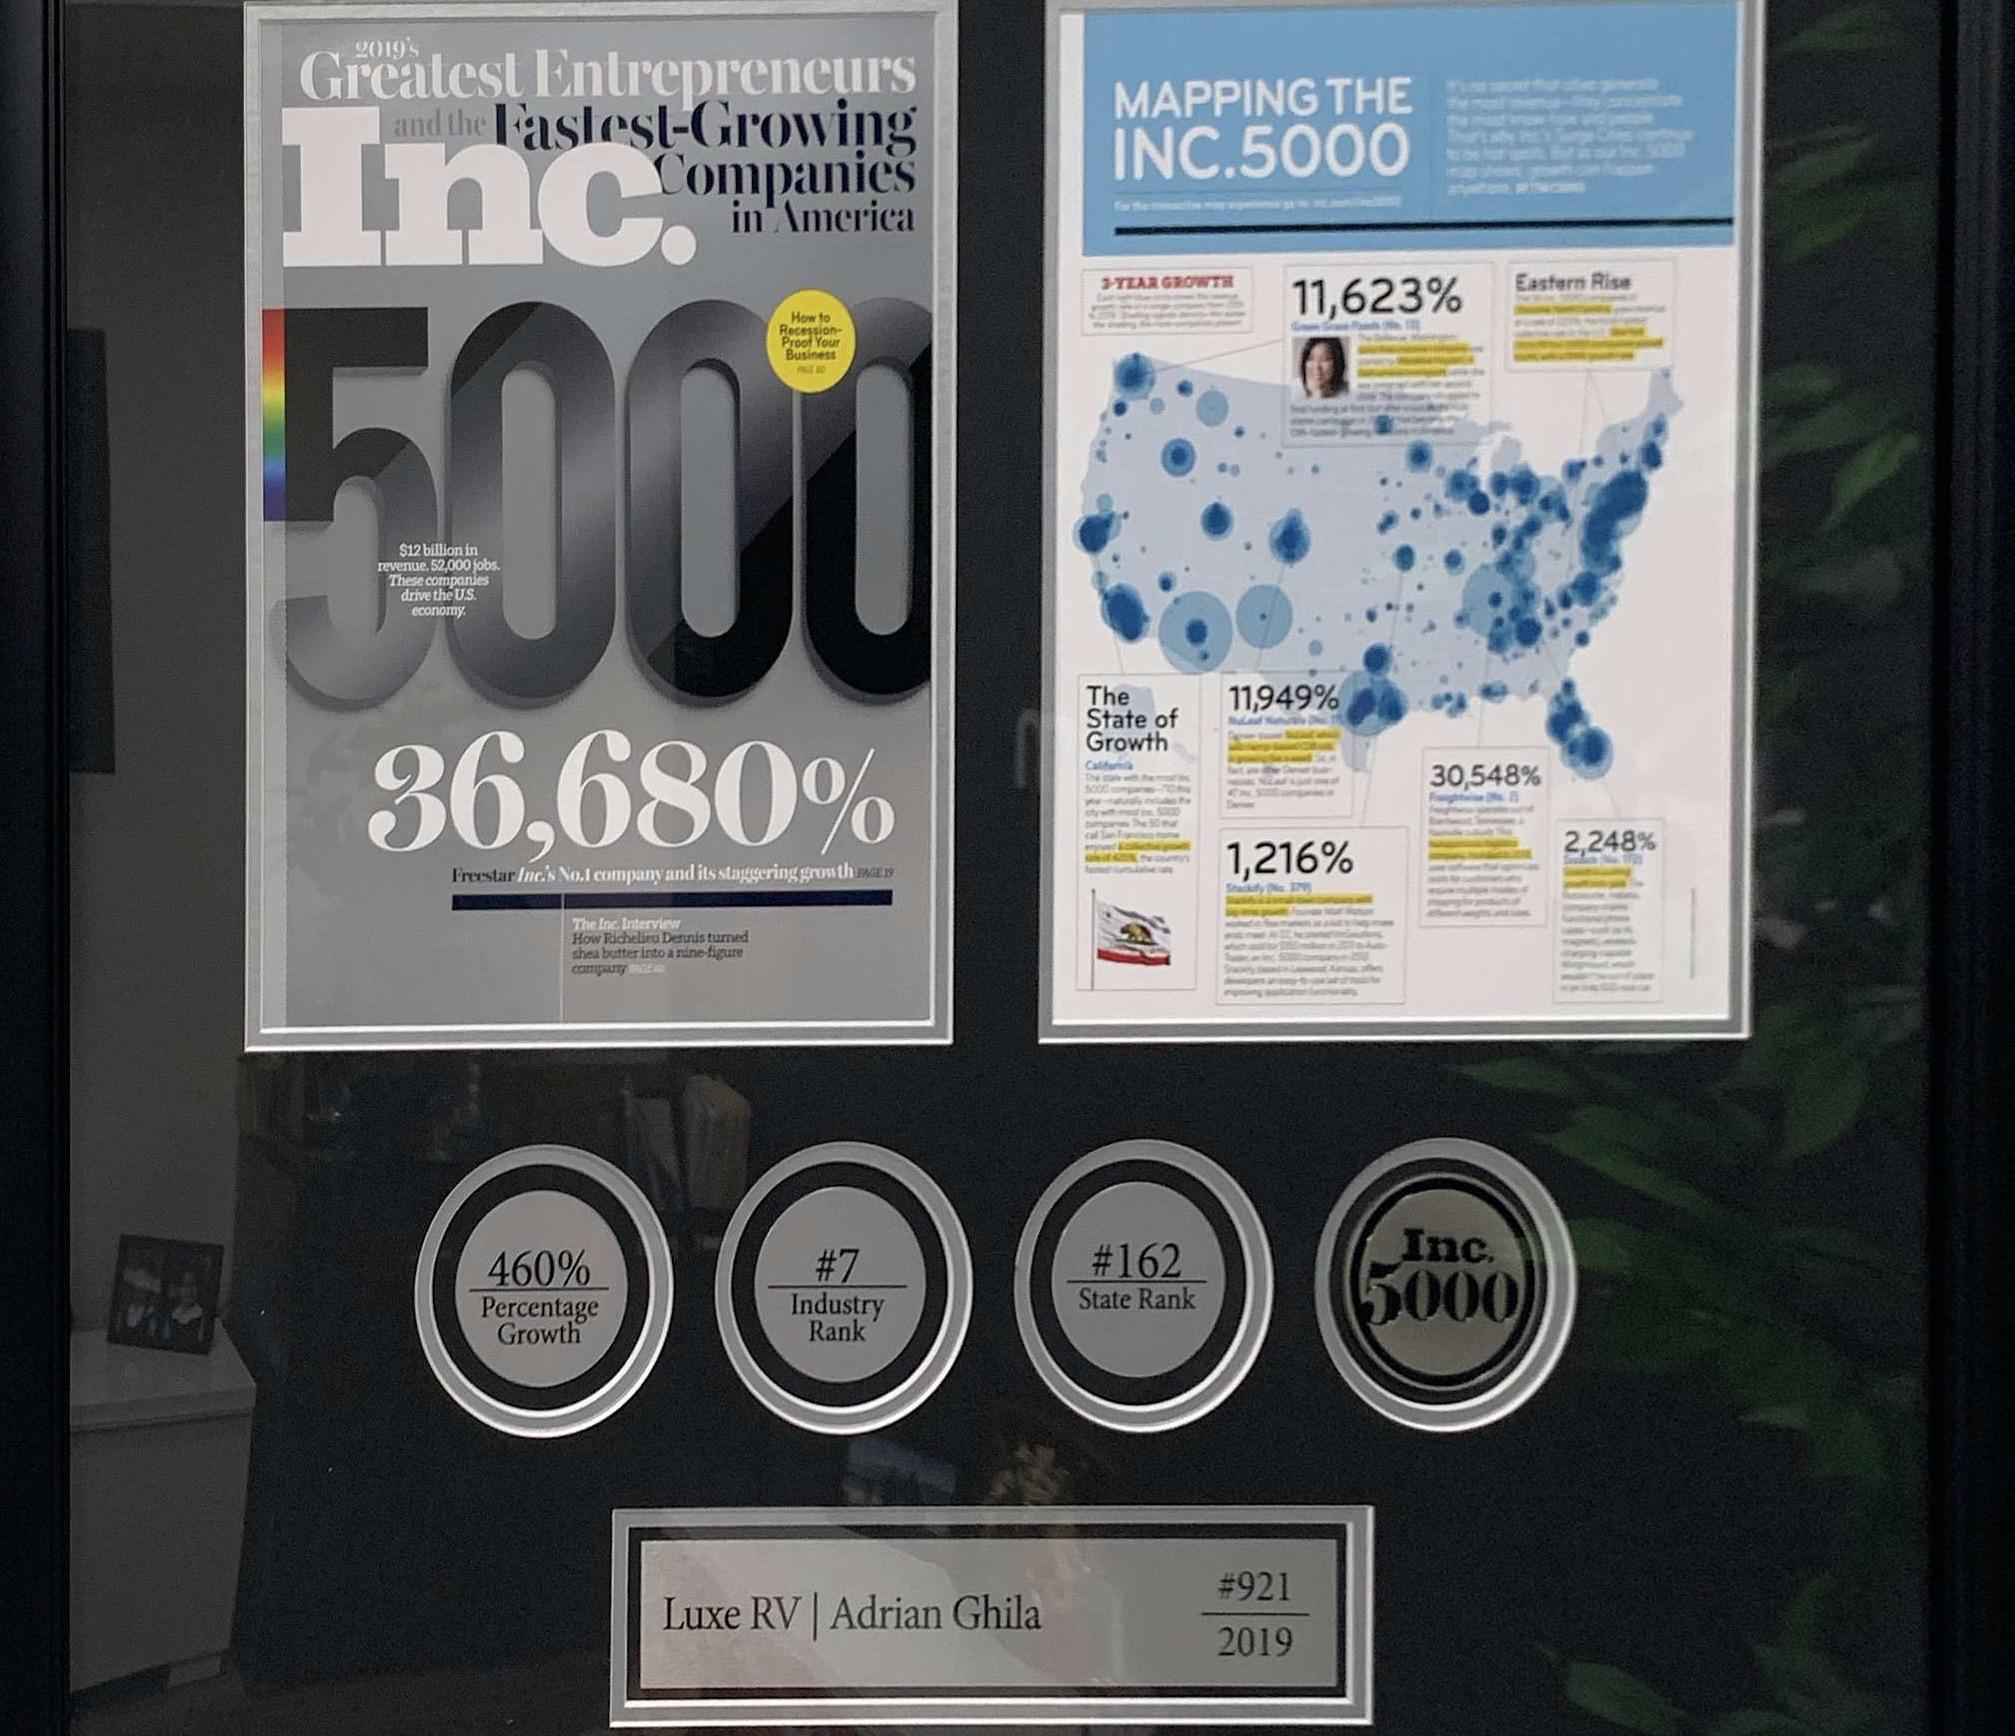 Inc 5000 Luxe RV